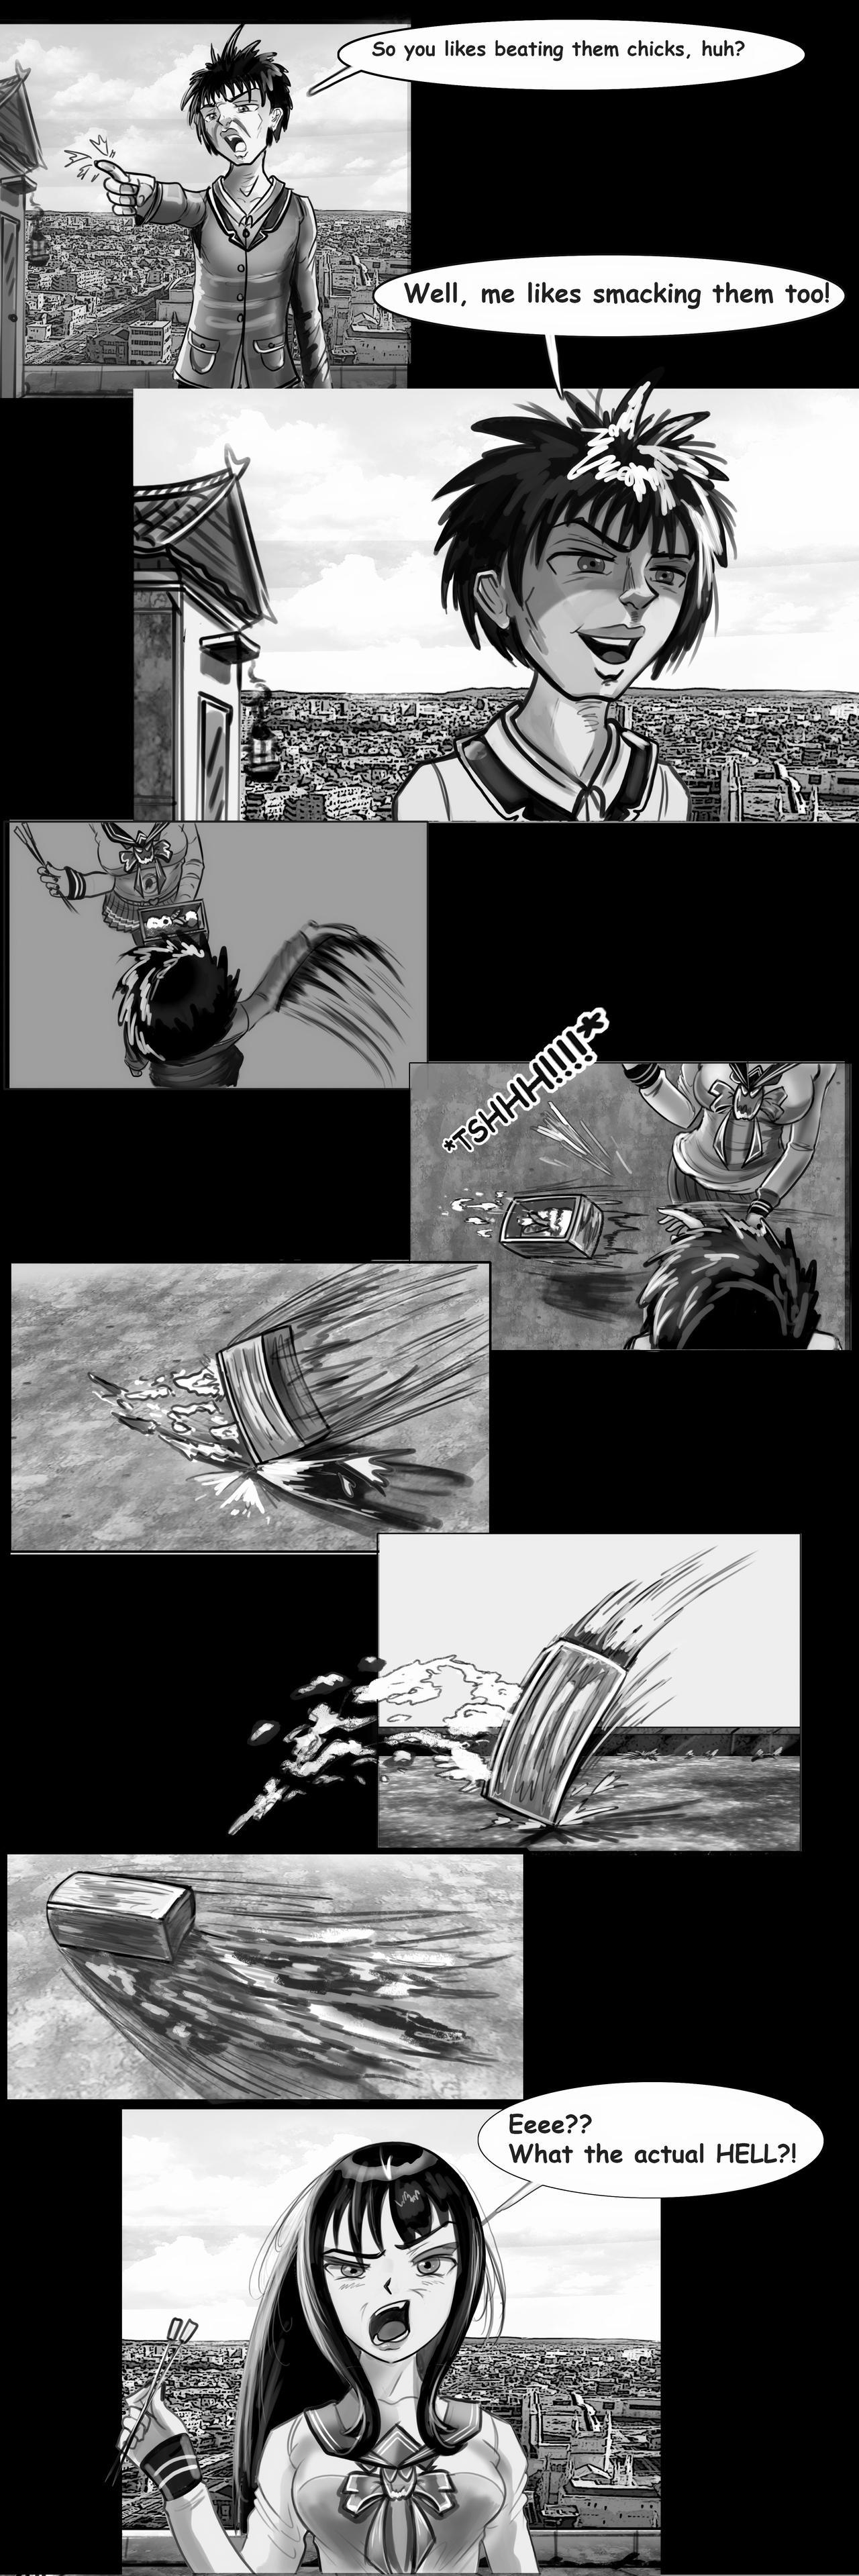 https://img2.nineanime.com/comics/pic4/4/33284/1671014/169557952c3a937230c3c8880146f494.jpg Page 1